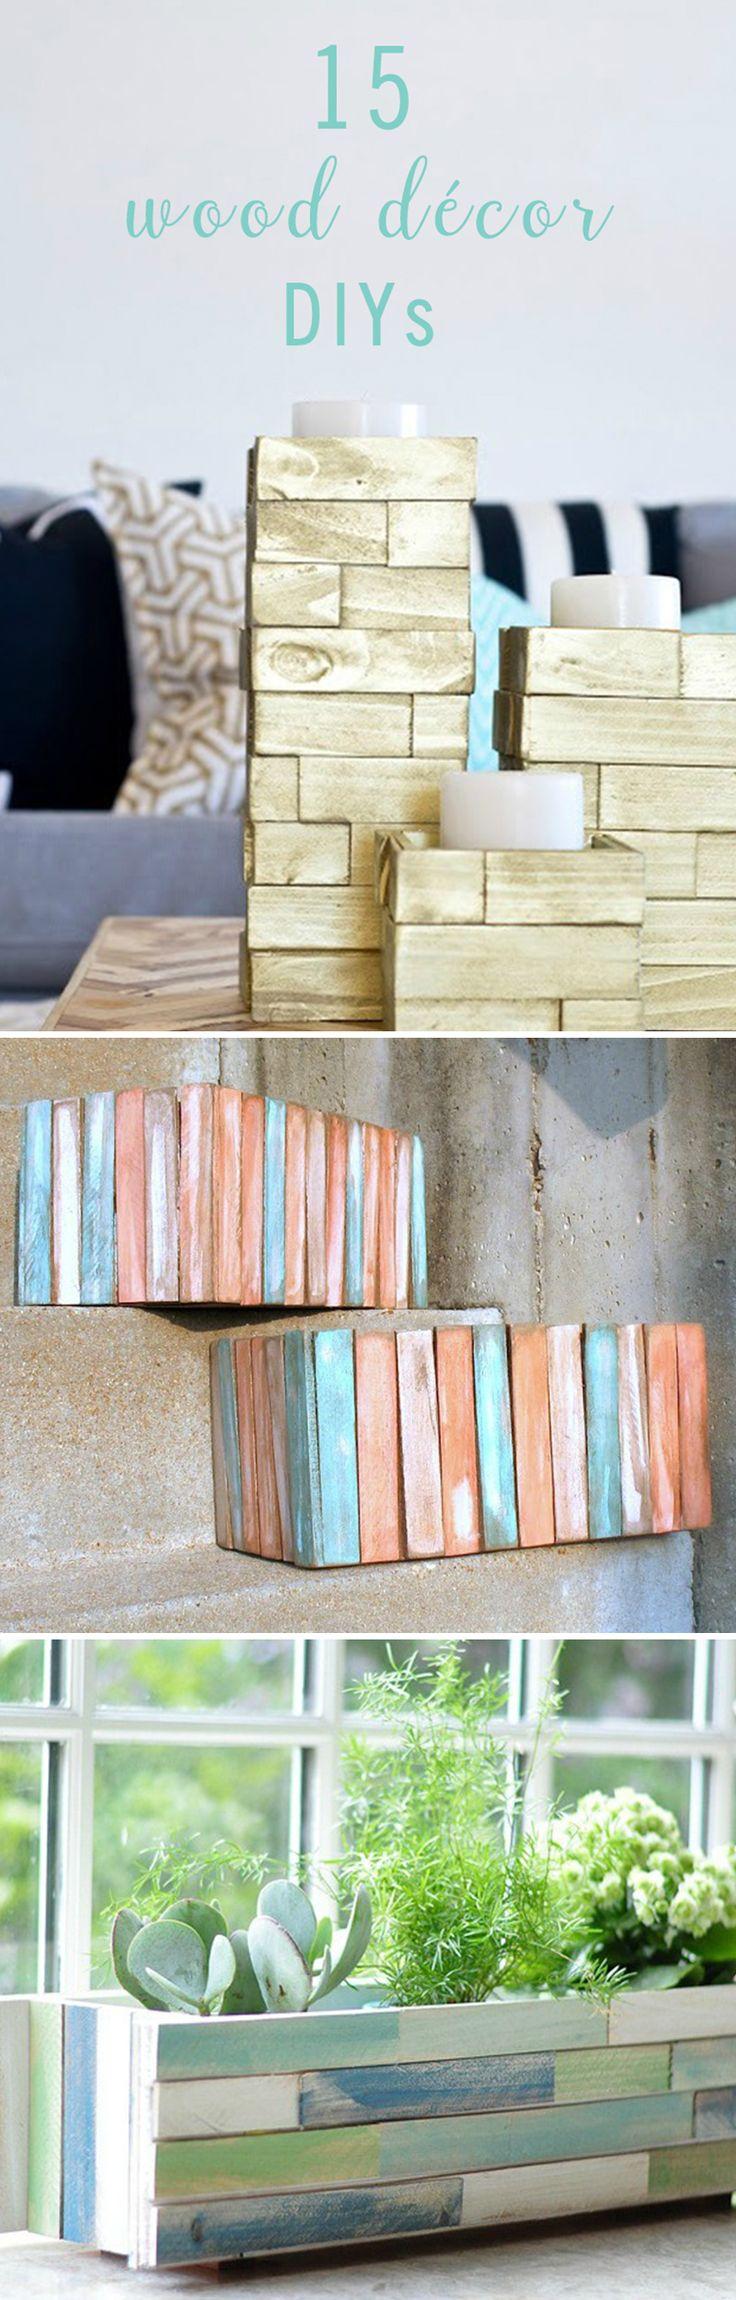 88 best home decor ideas images on pinterest baby crafts baby 15 easy wood dcor diys diy ideasdecor solutioingenieria Image collections